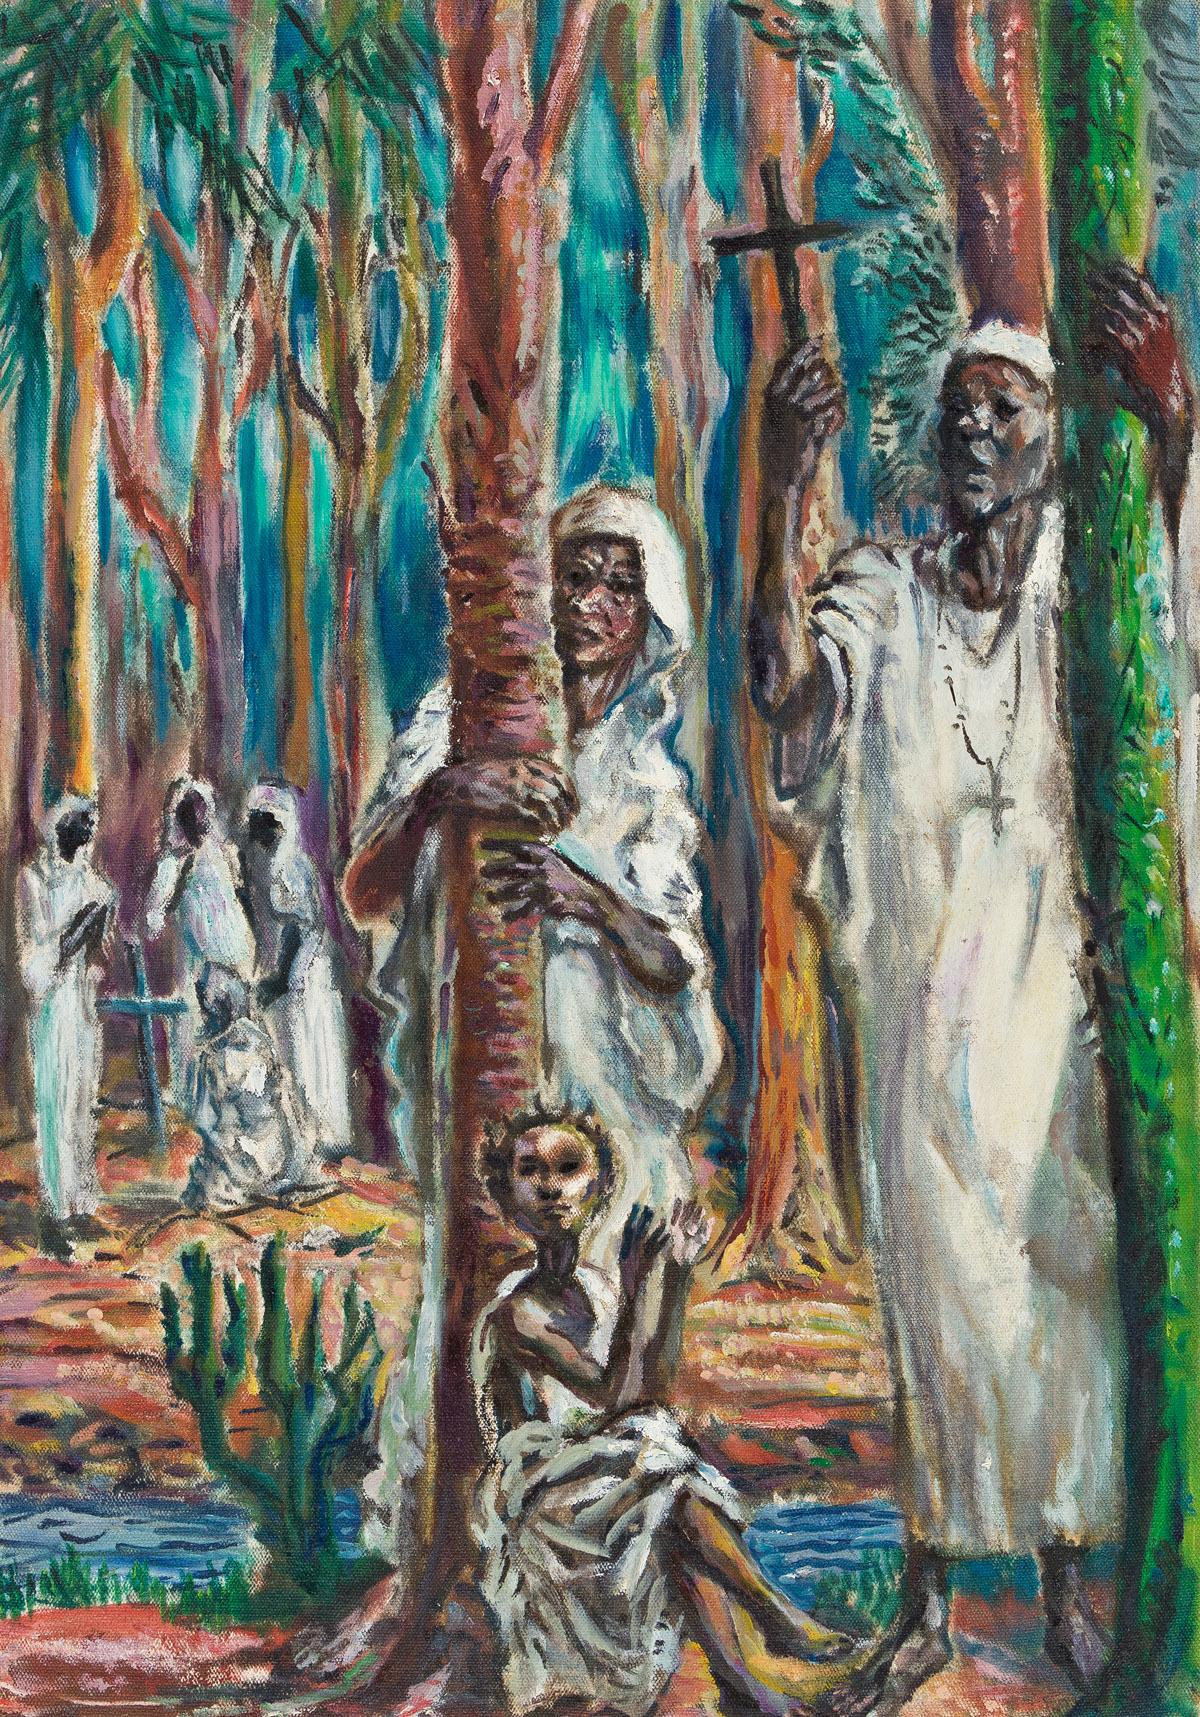 JAMES A. PORTER (1905 - 1970) Seraphim and Cherubim, Lagos.